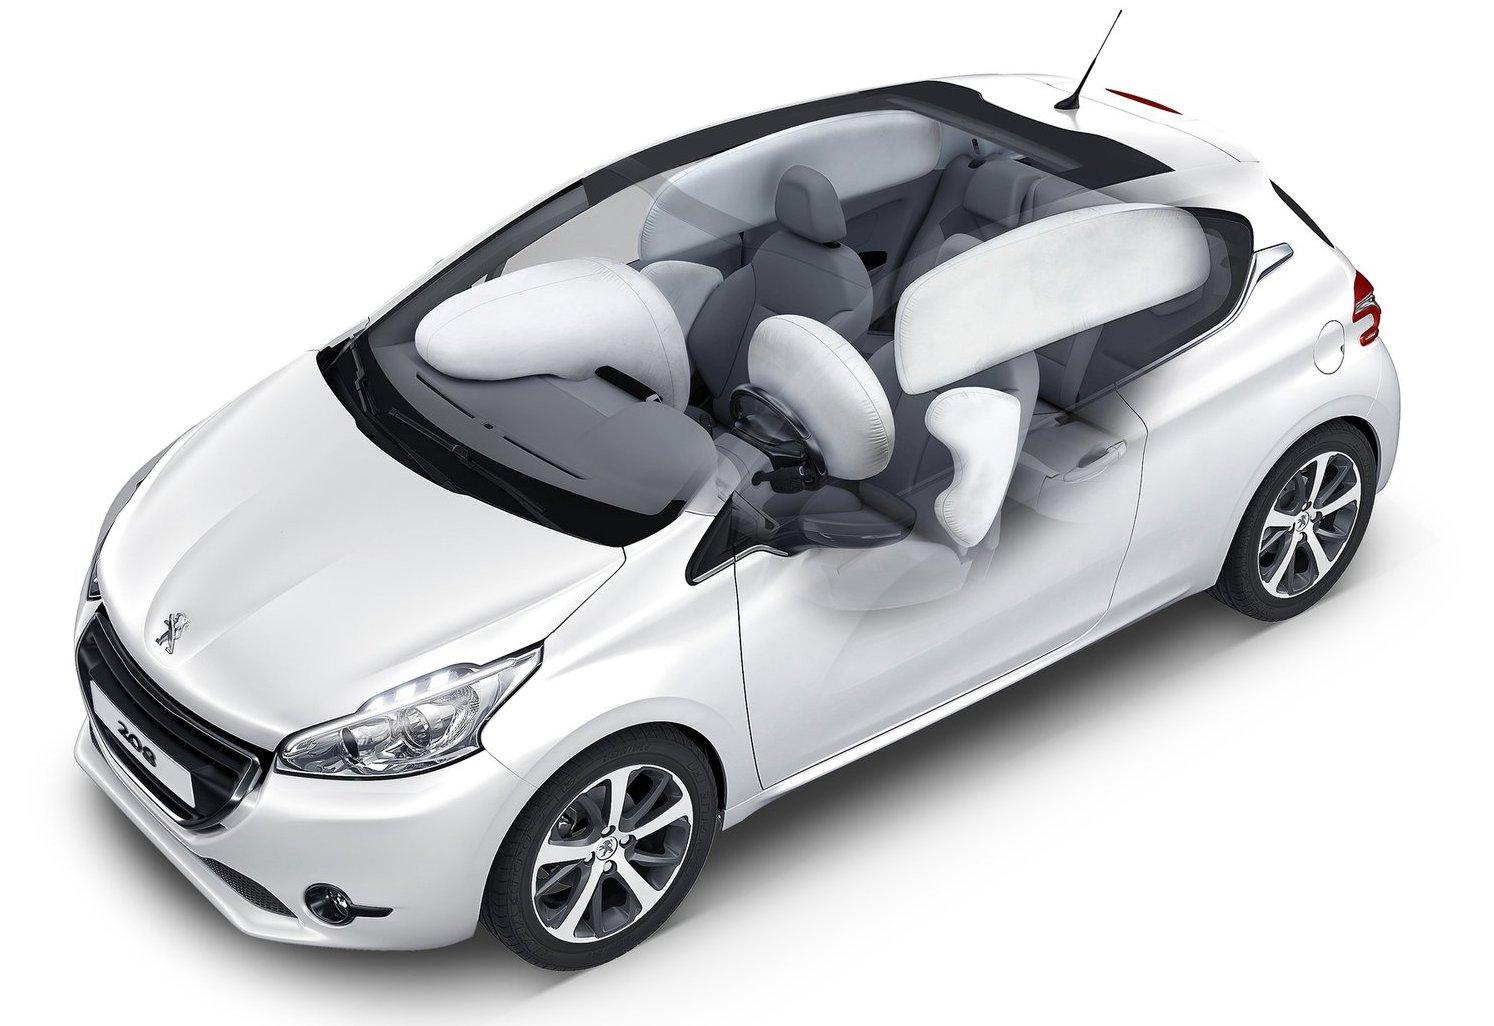 Drawings - 1/2 - Peugeot 208 (2012) - http://newpeugeot208.free.fr/